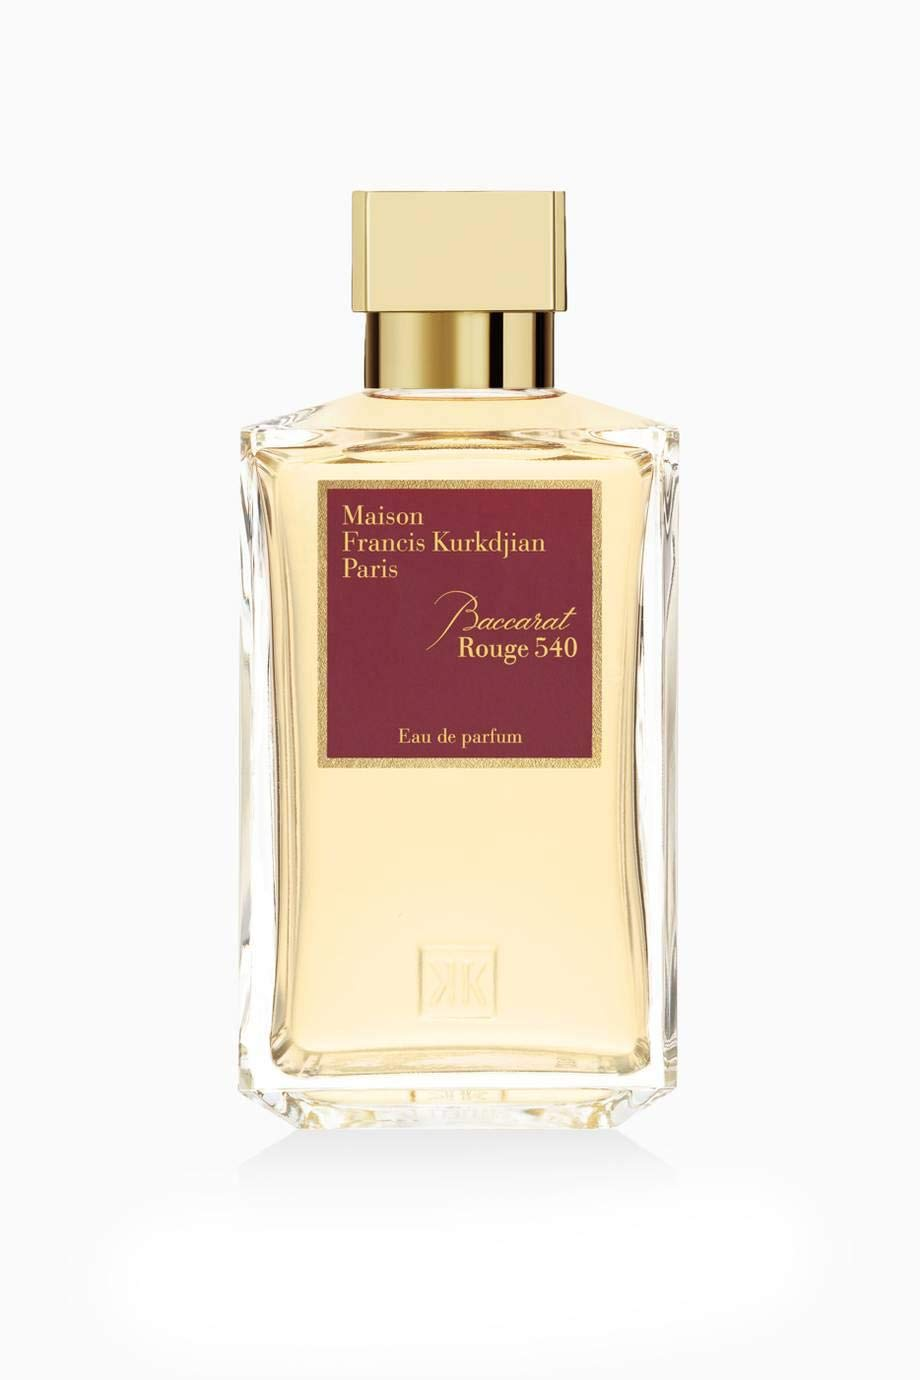 MAISON FRANCIS KURKDJIAN BACCARAT ROUGE 540 by Maison Francis